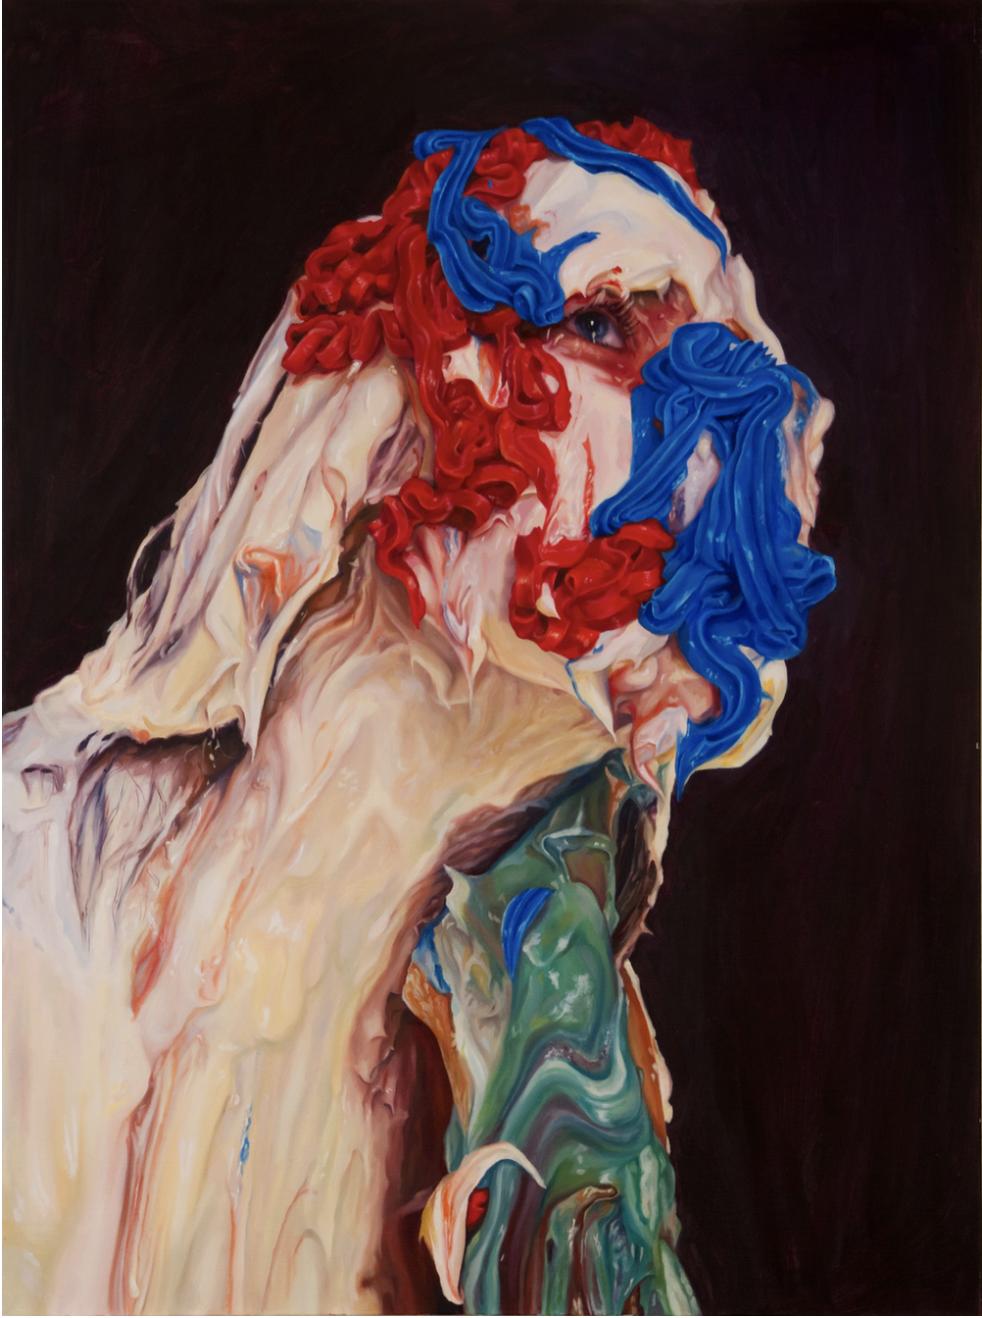 <br><b>Marisa Adesman</b><br>Sweet Pomona<br>40 x 30 in.